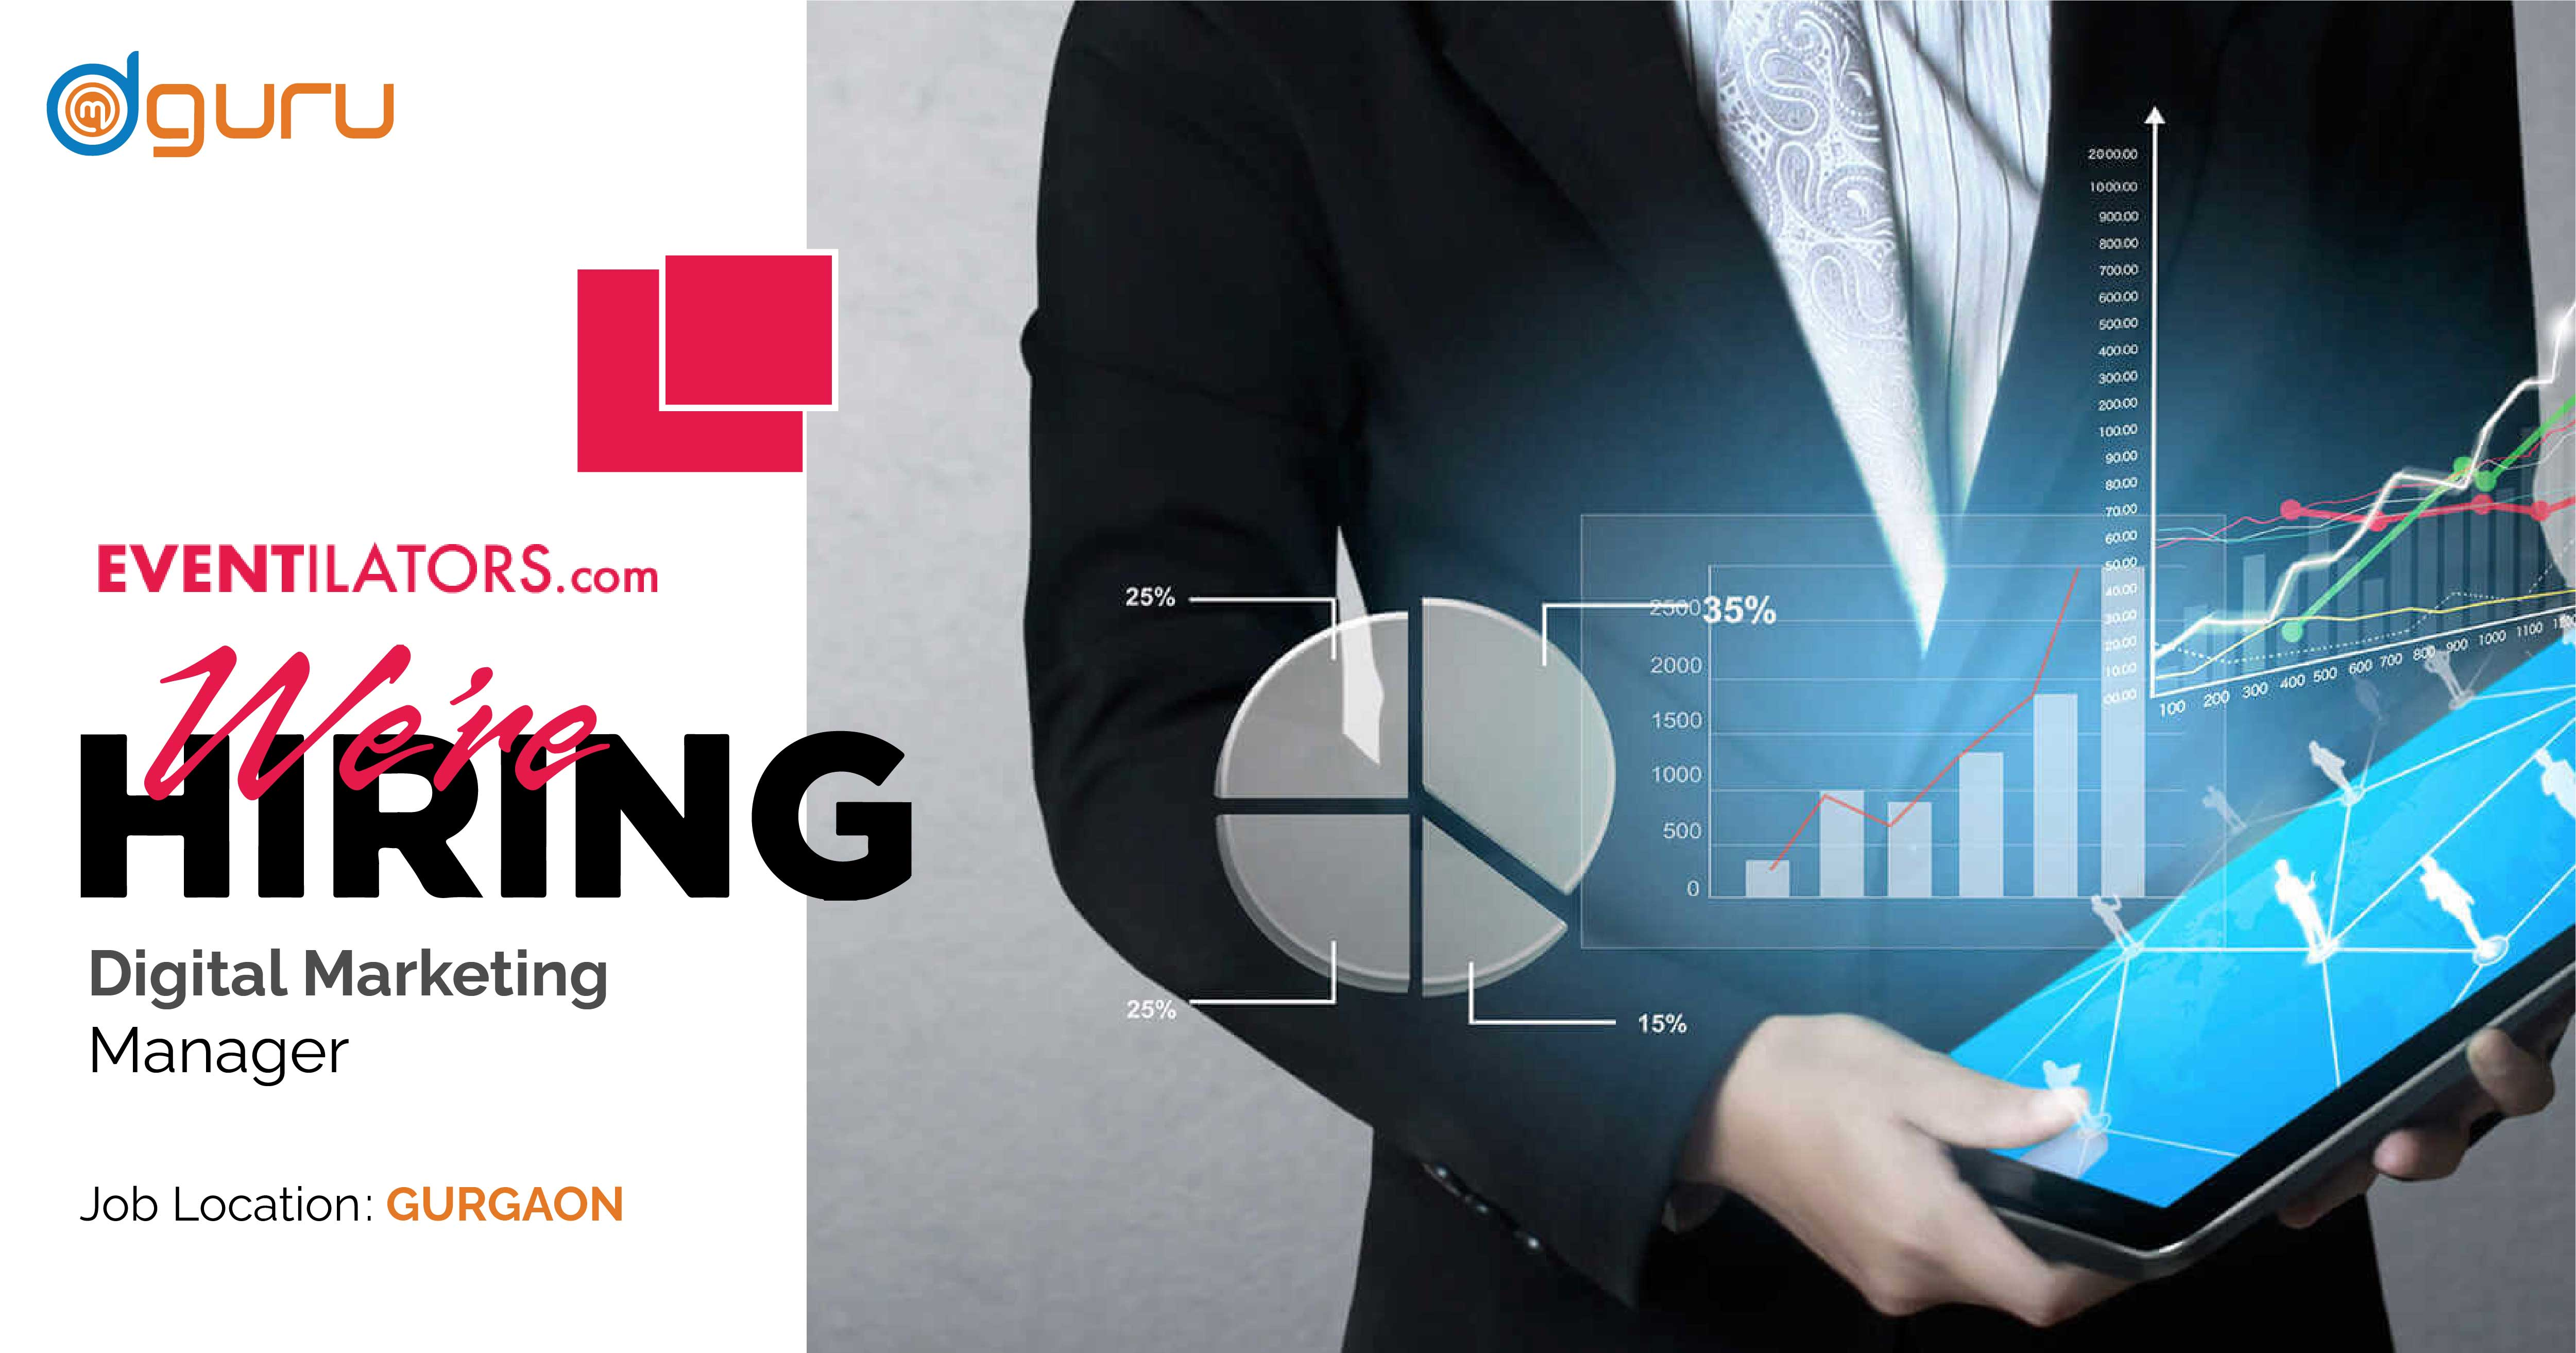 Digital Marketing Manager at Eventilators